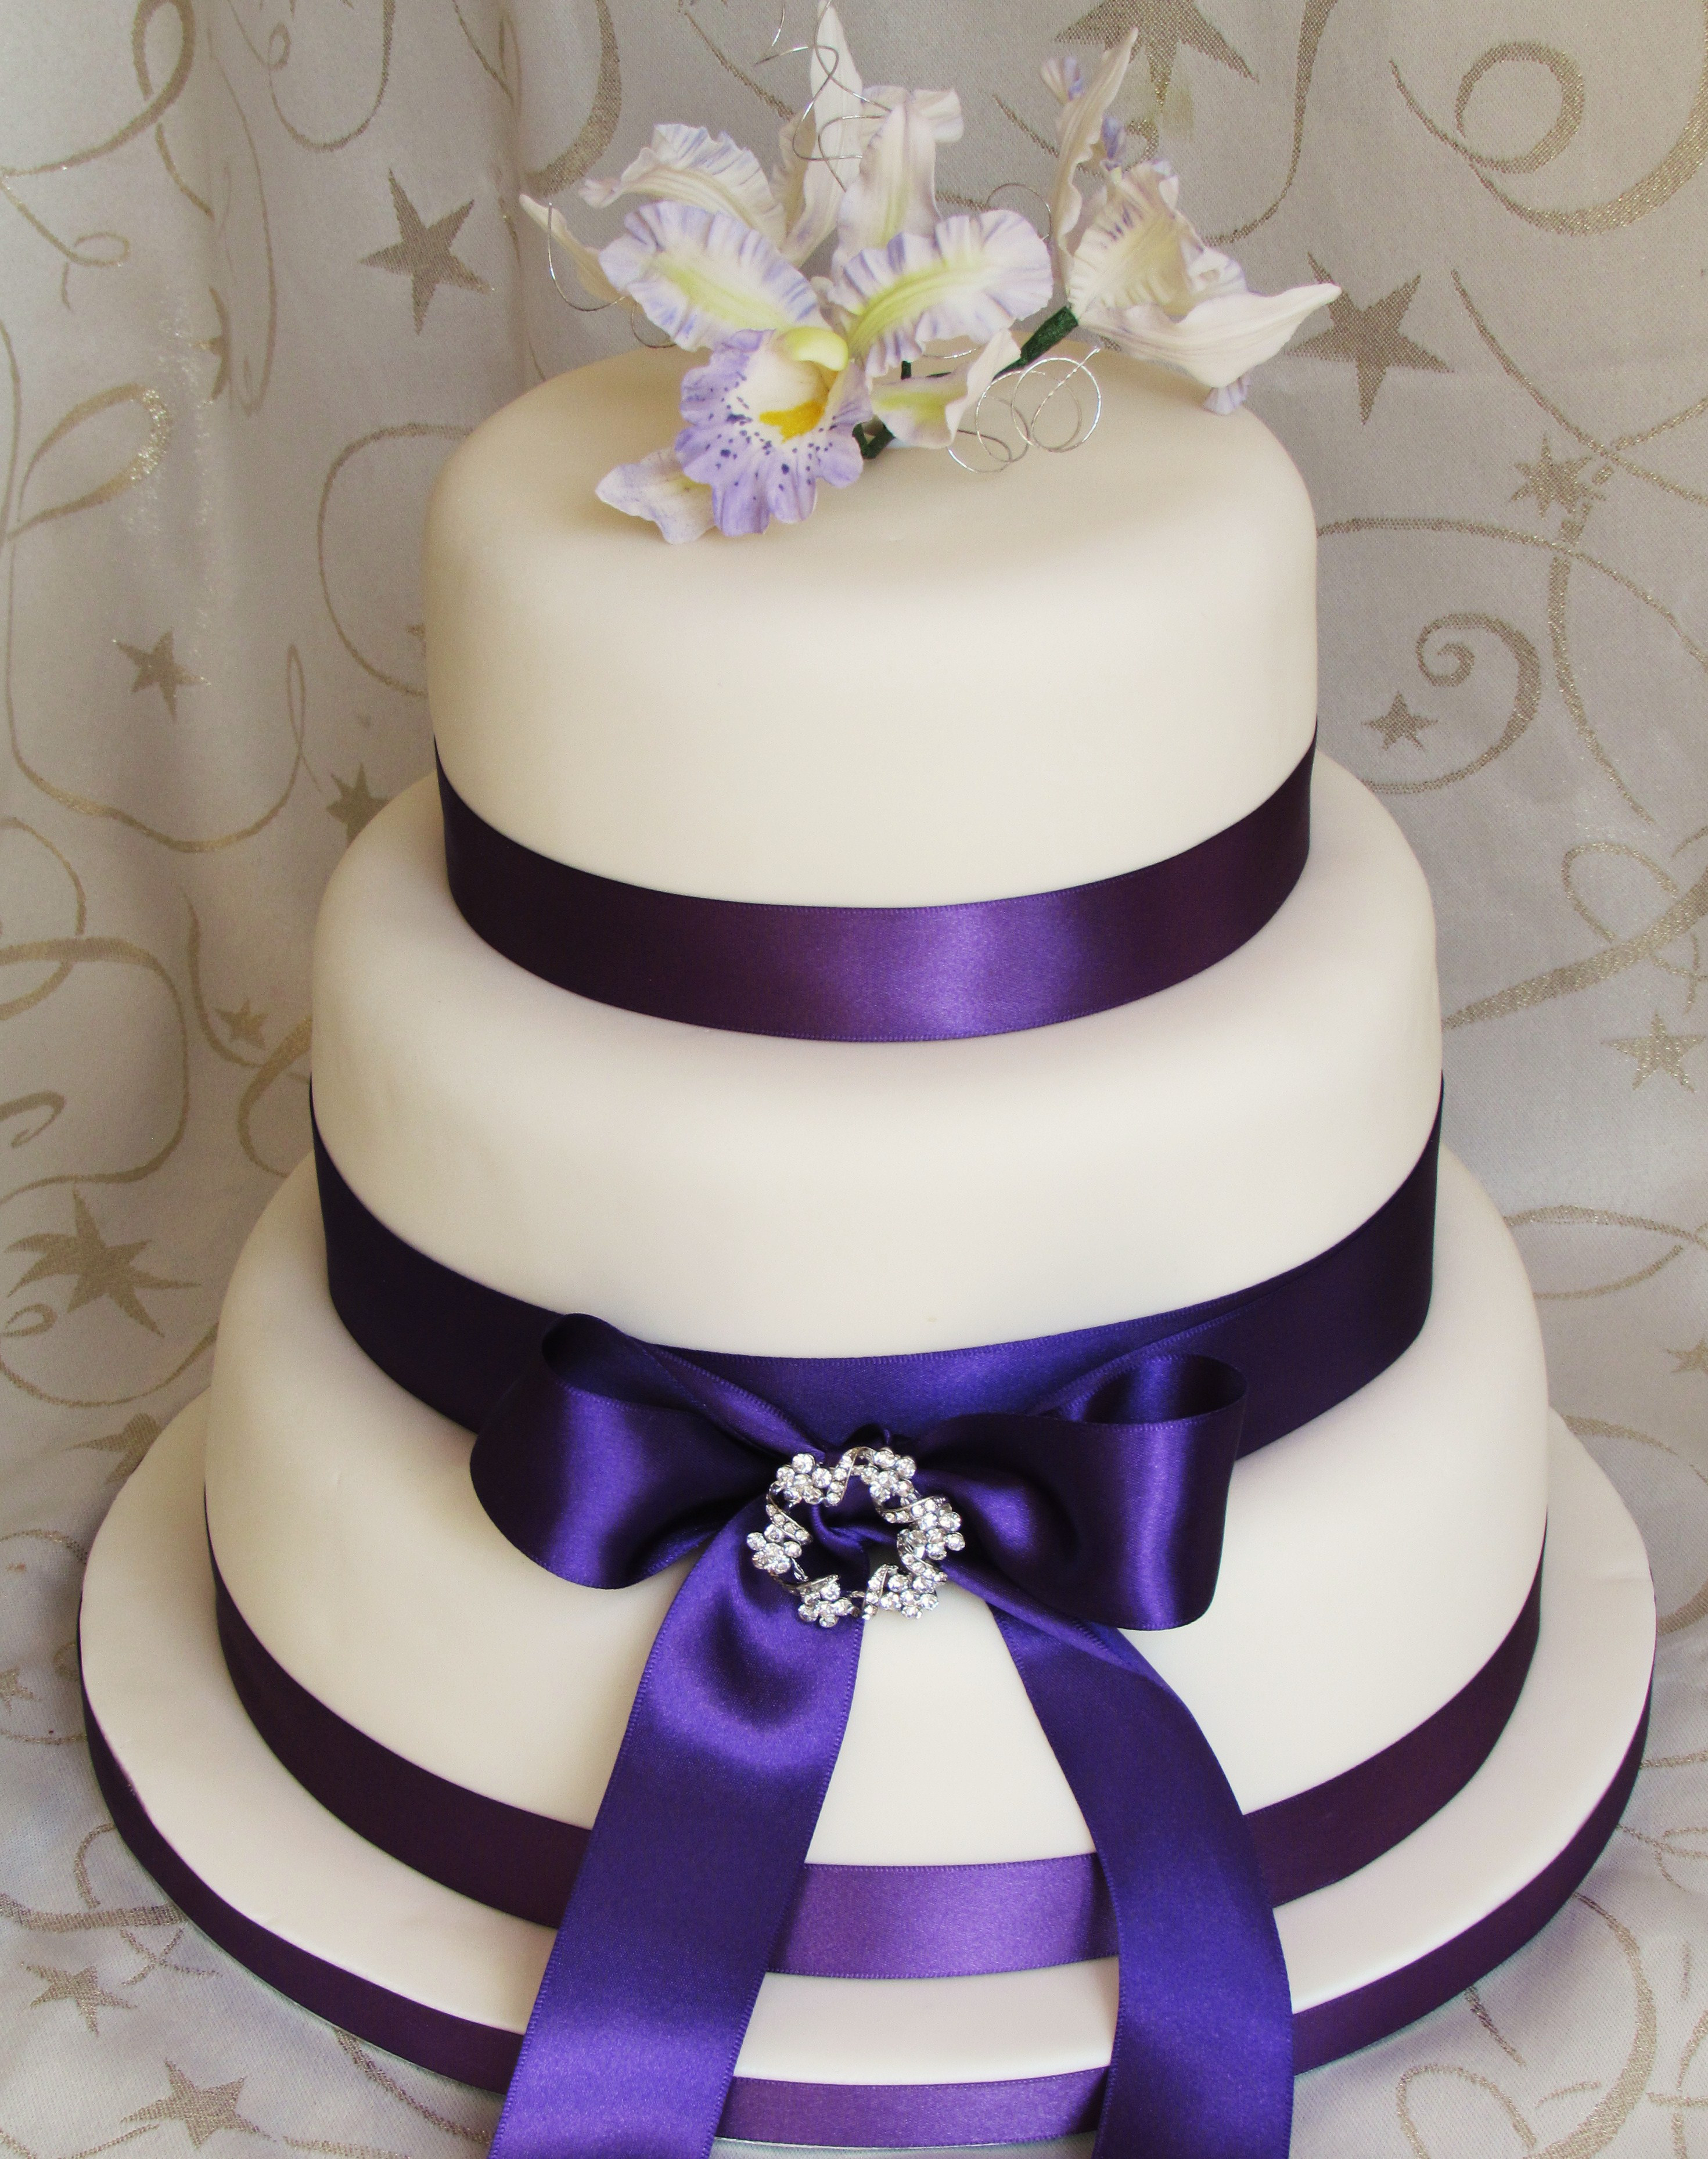 Traditional Wedding Cakes  Traditional wedding cakes prices idea in 2017